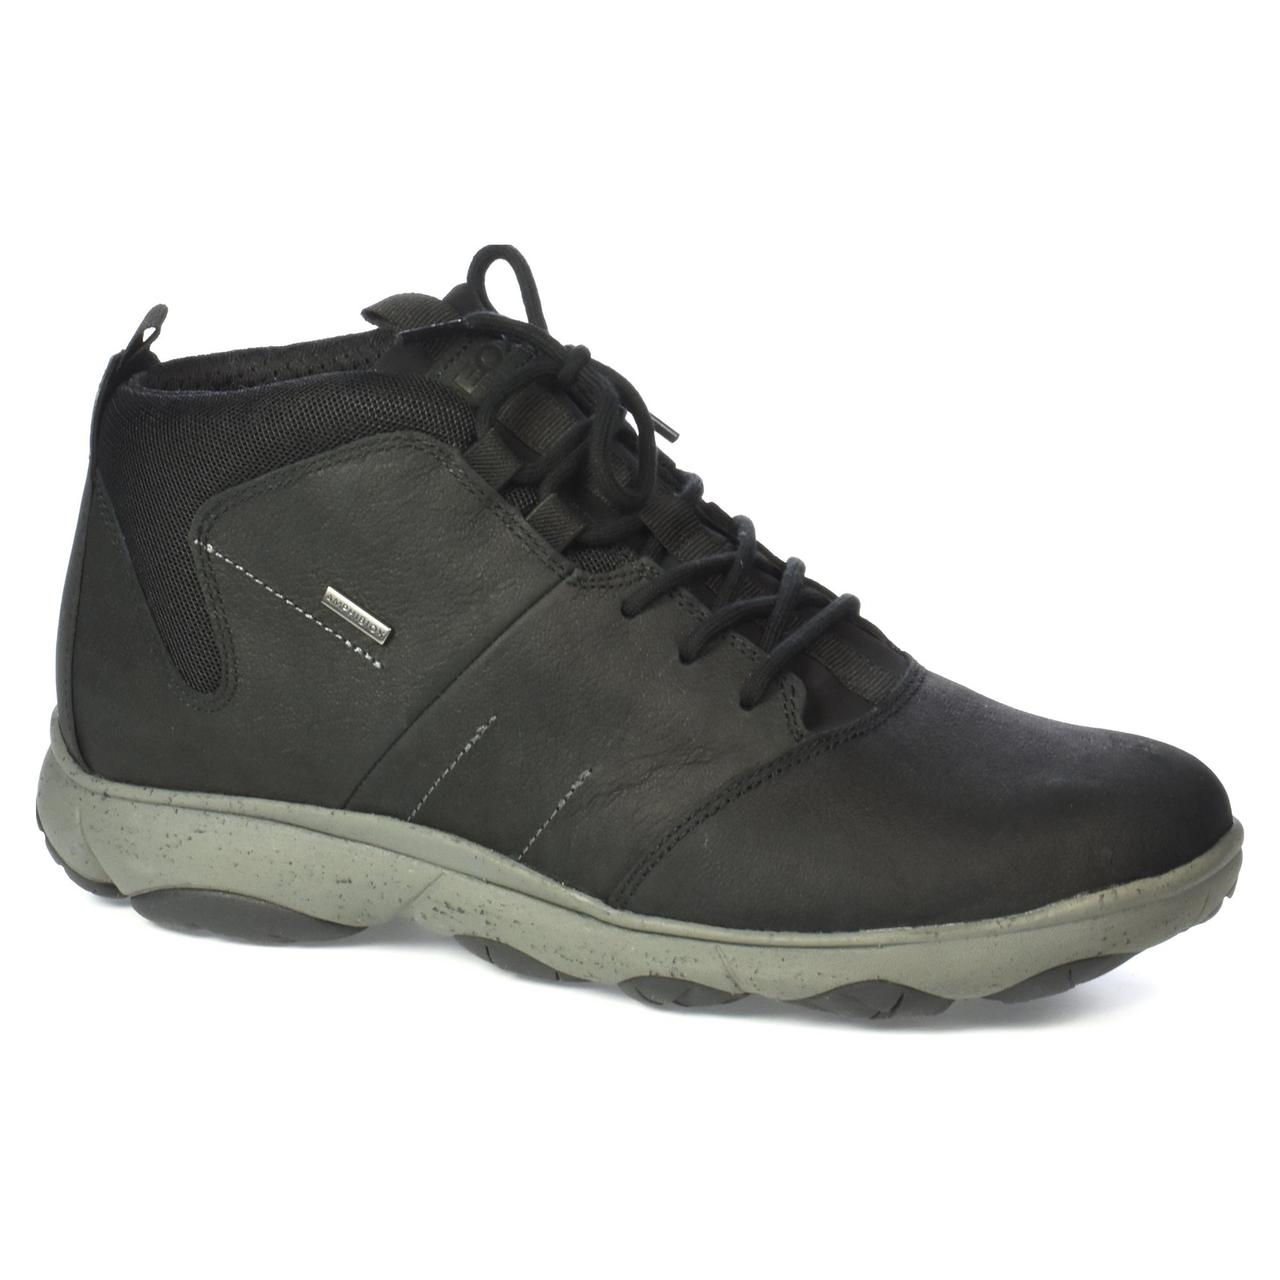 d049c0f97 Повседневные ботинки Geox Amphibiox U742VA-000TI-C9999, код: 2857,  последний размер